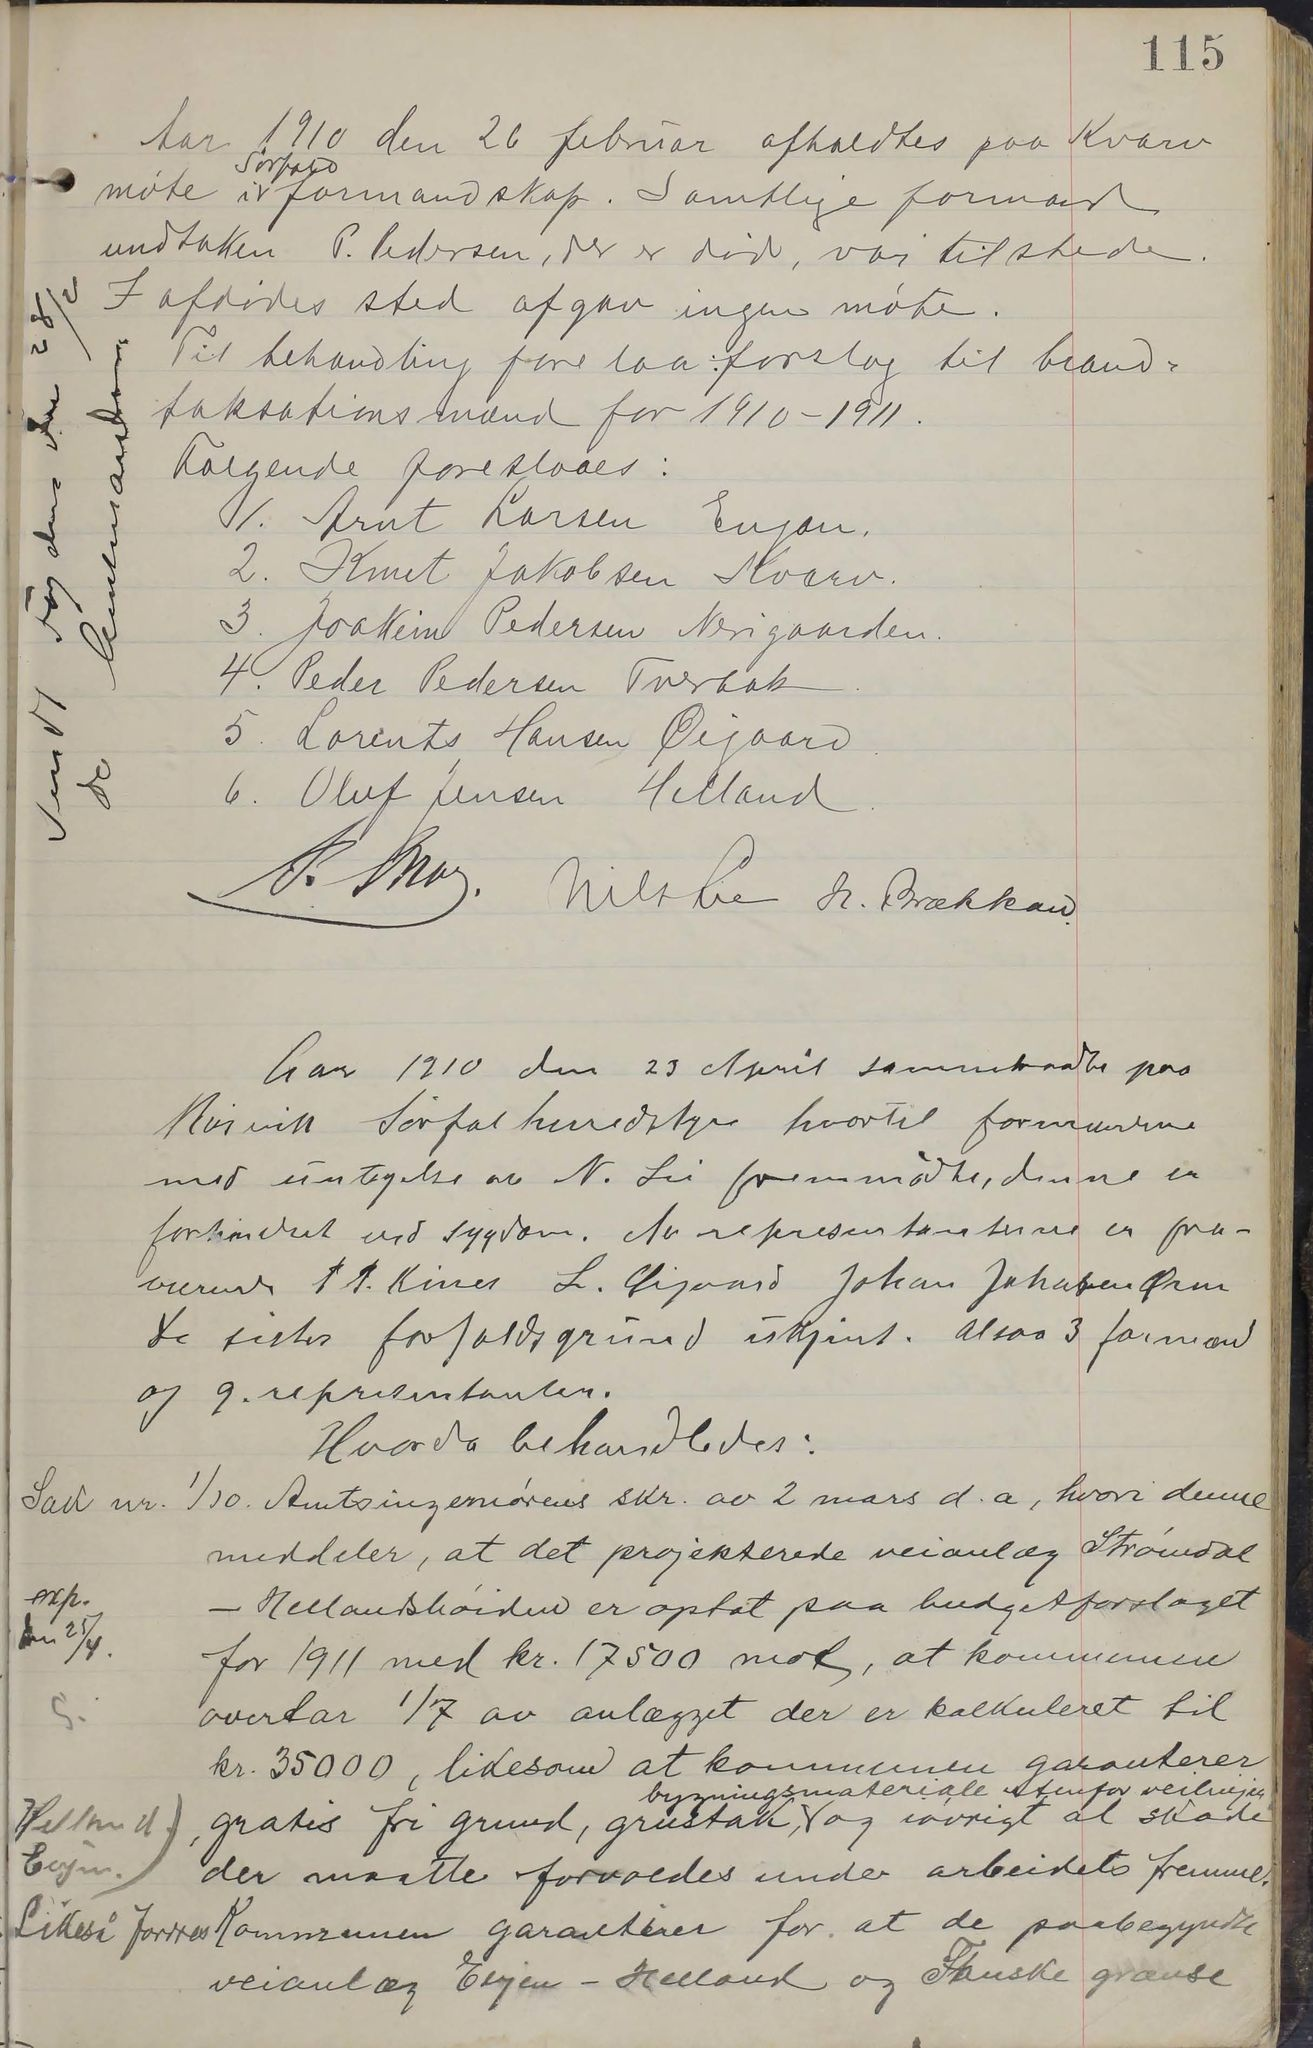 AIN, Sørfold kommune. Formannskap, 100/L0002: Forhandlingsprotokol for Sørfoldens formandskab, 1902-1913, s. 115